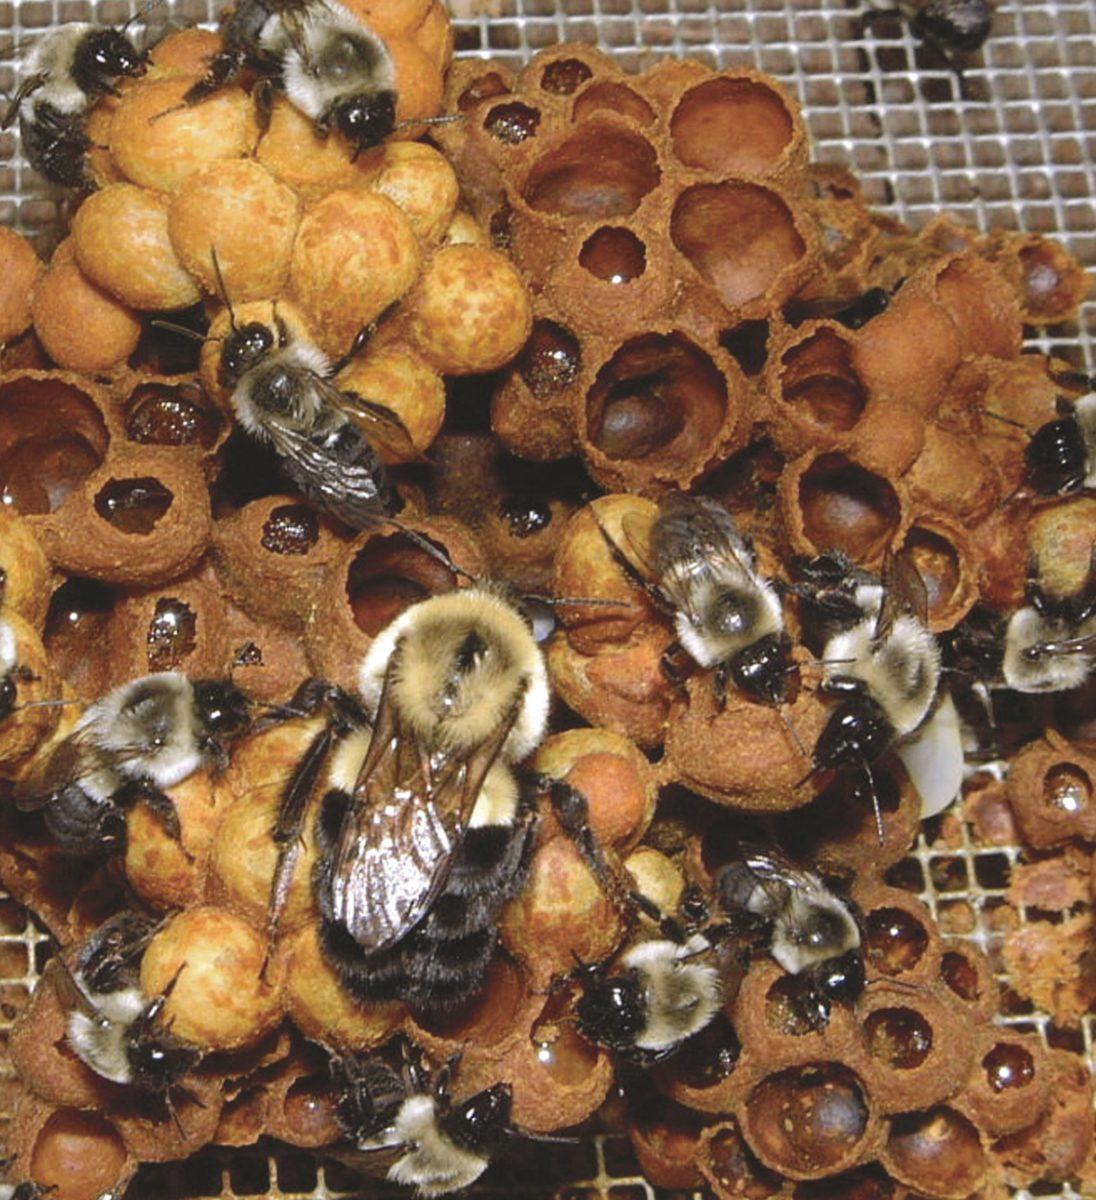 Bumble bee hive interior